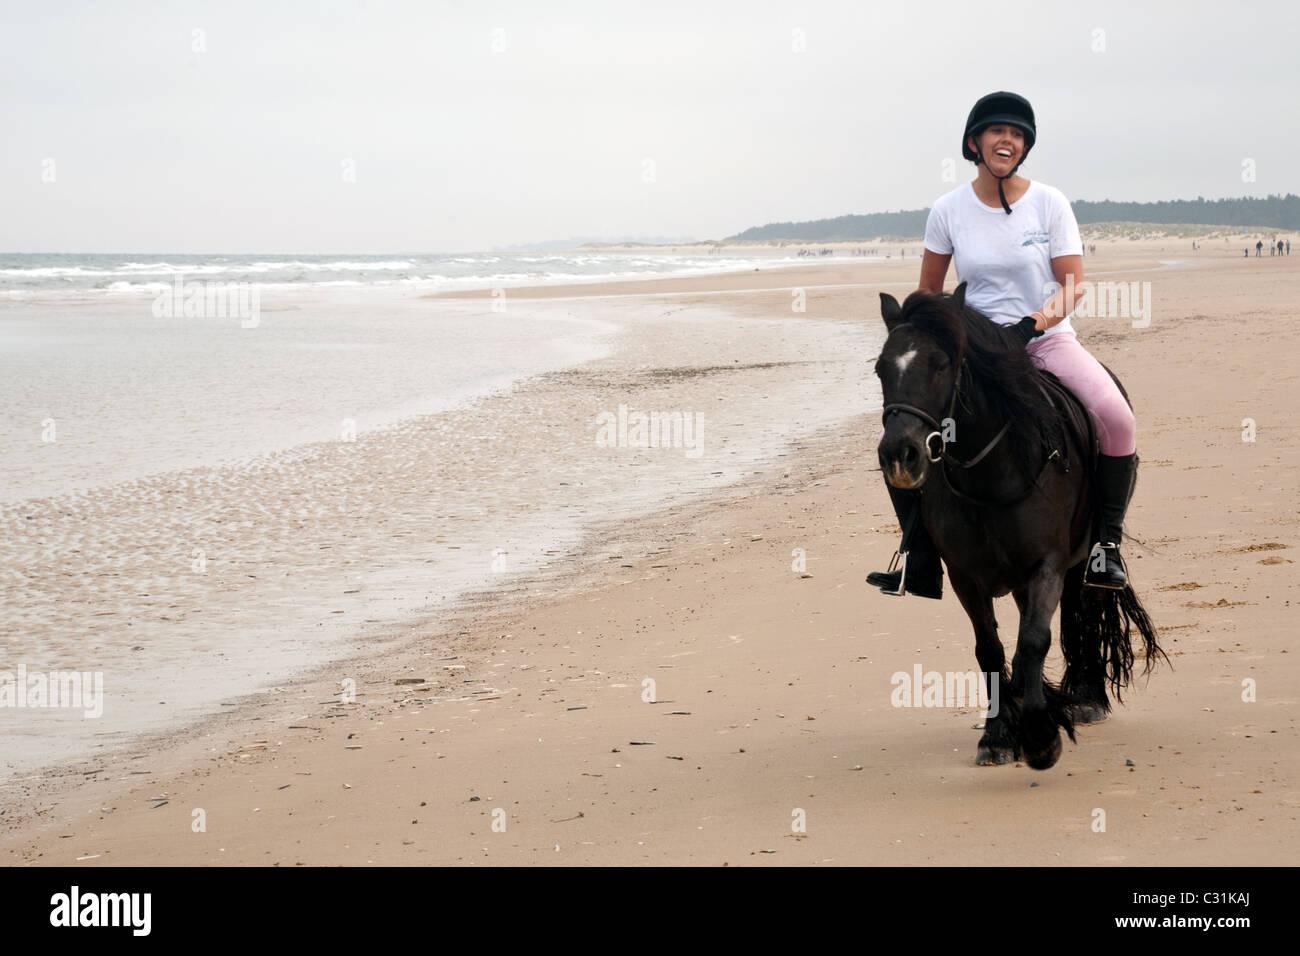 Girl riding her horse on Holkham Beach, North Norfolk, UK - Stock Image